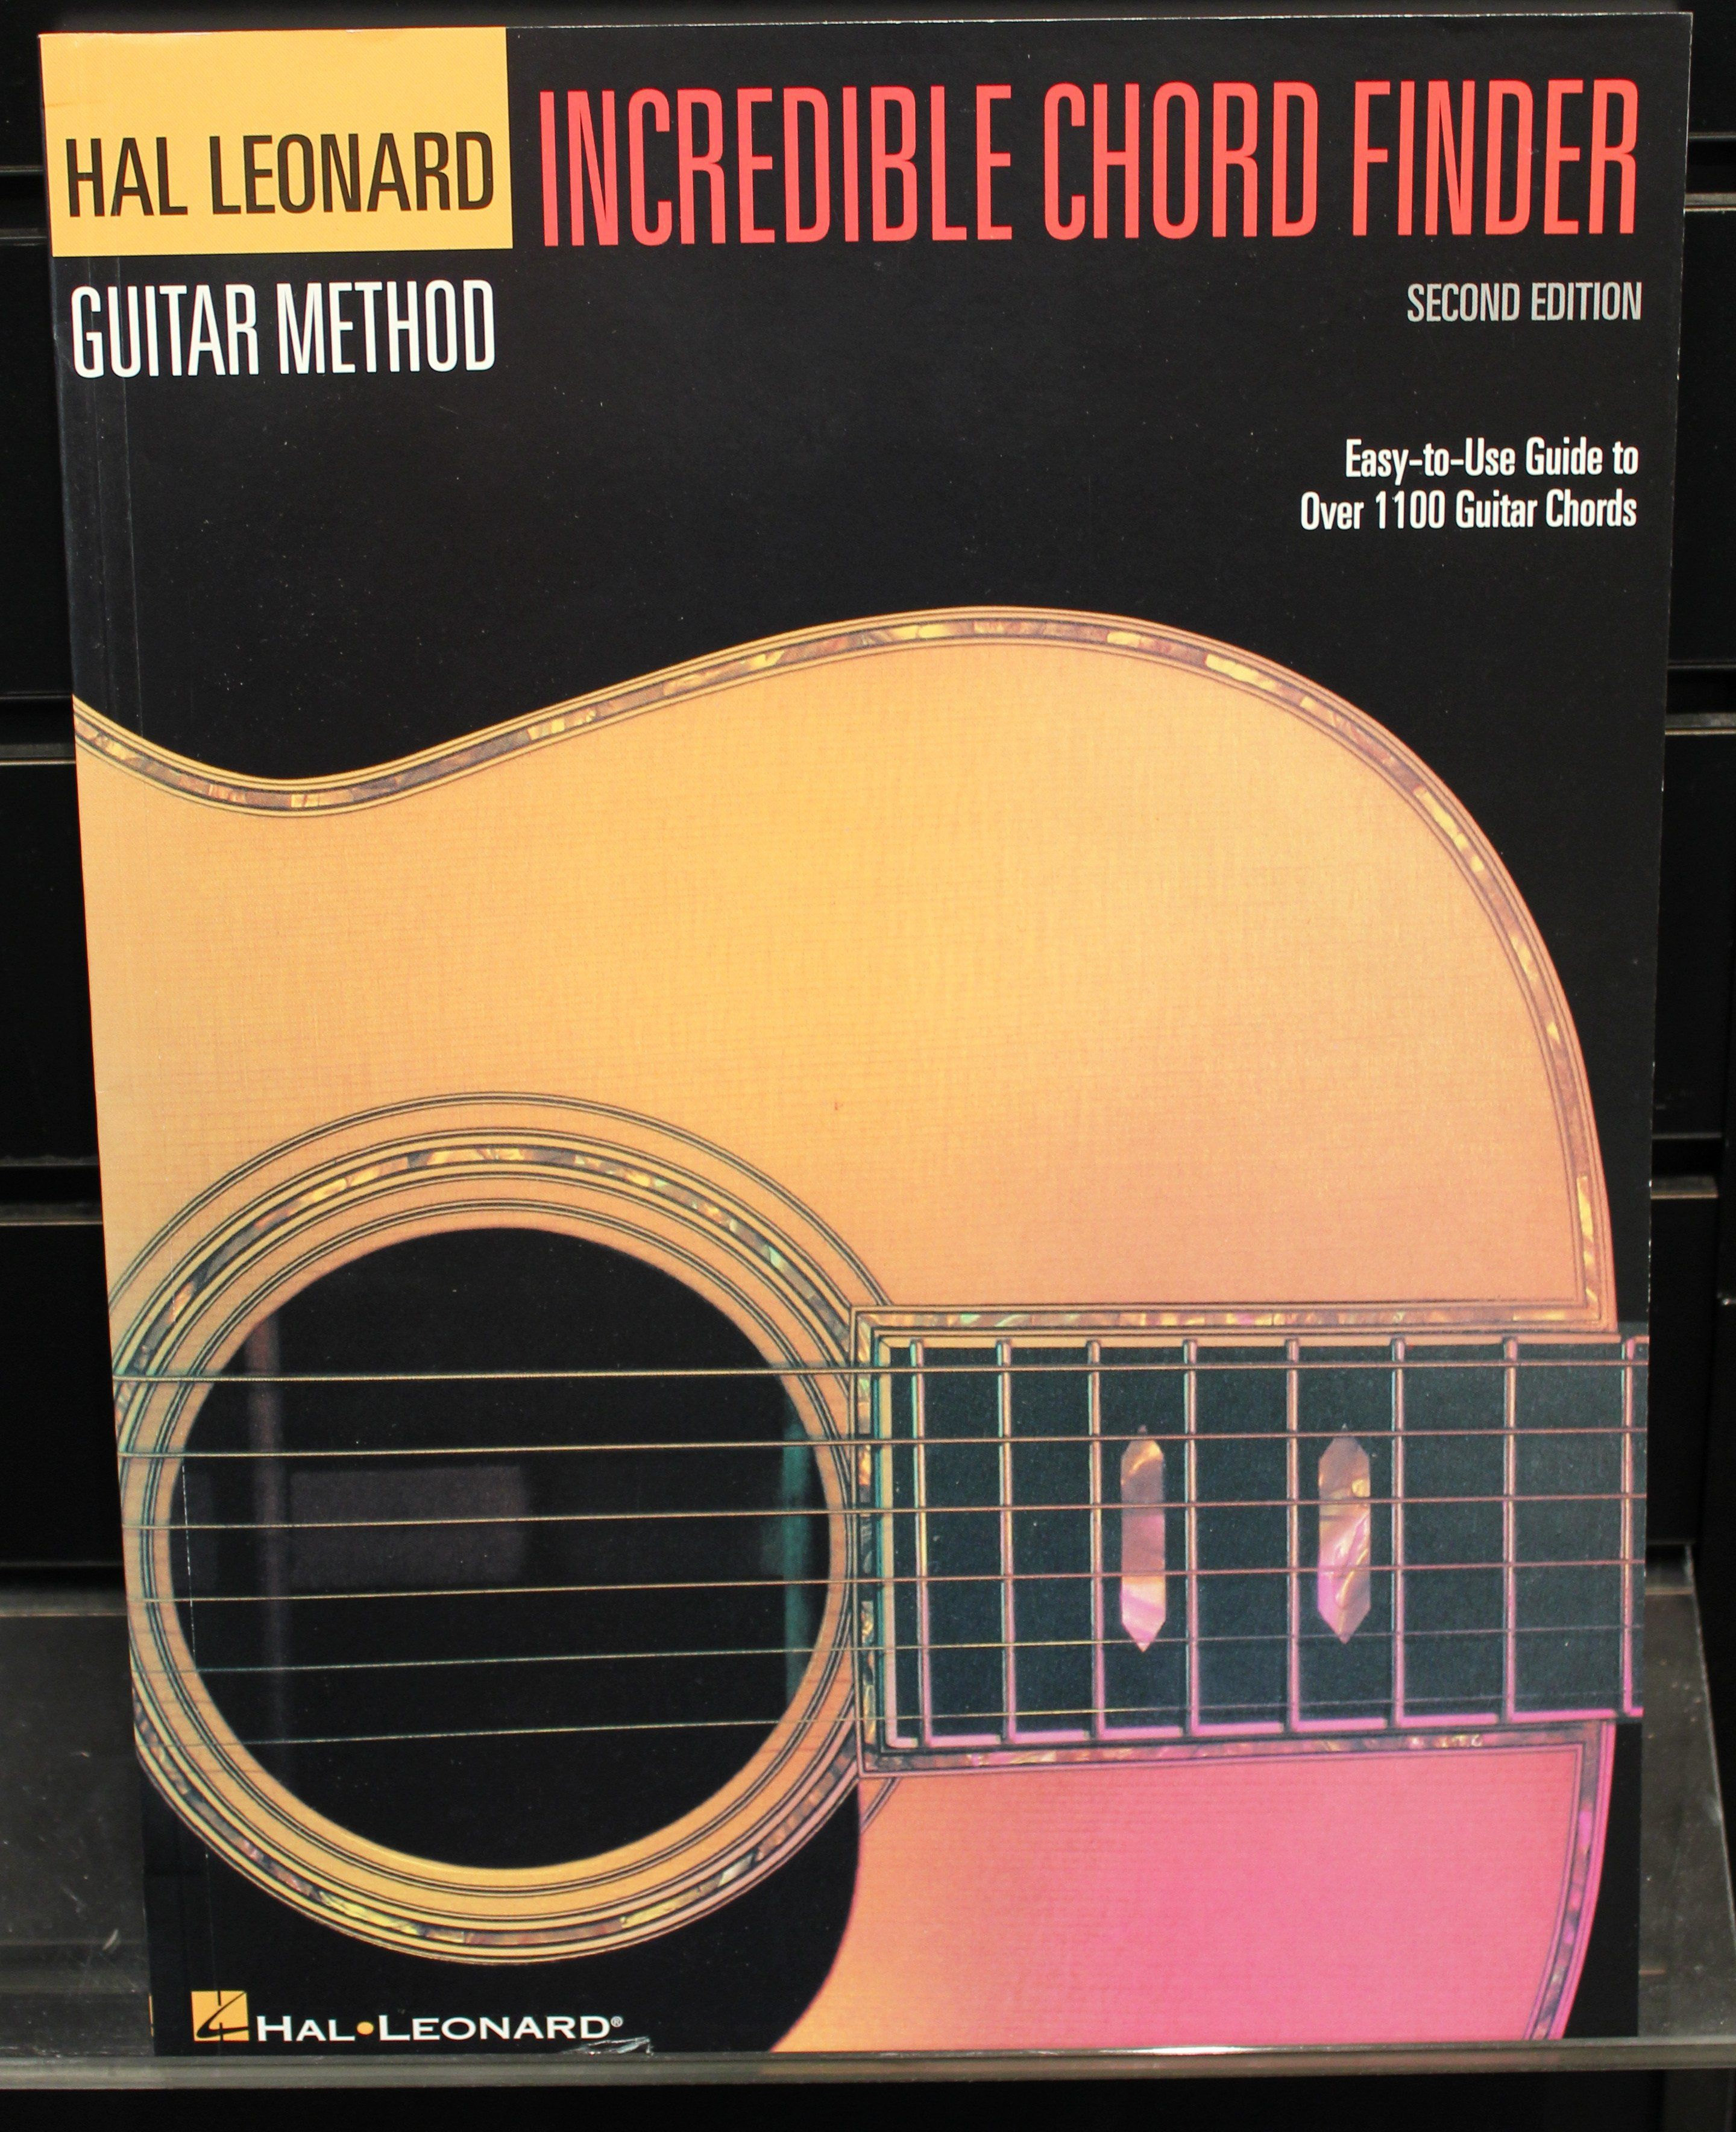 Incredible Chord Finder 9 X 12 Edition Hal Leonard Guitar Method